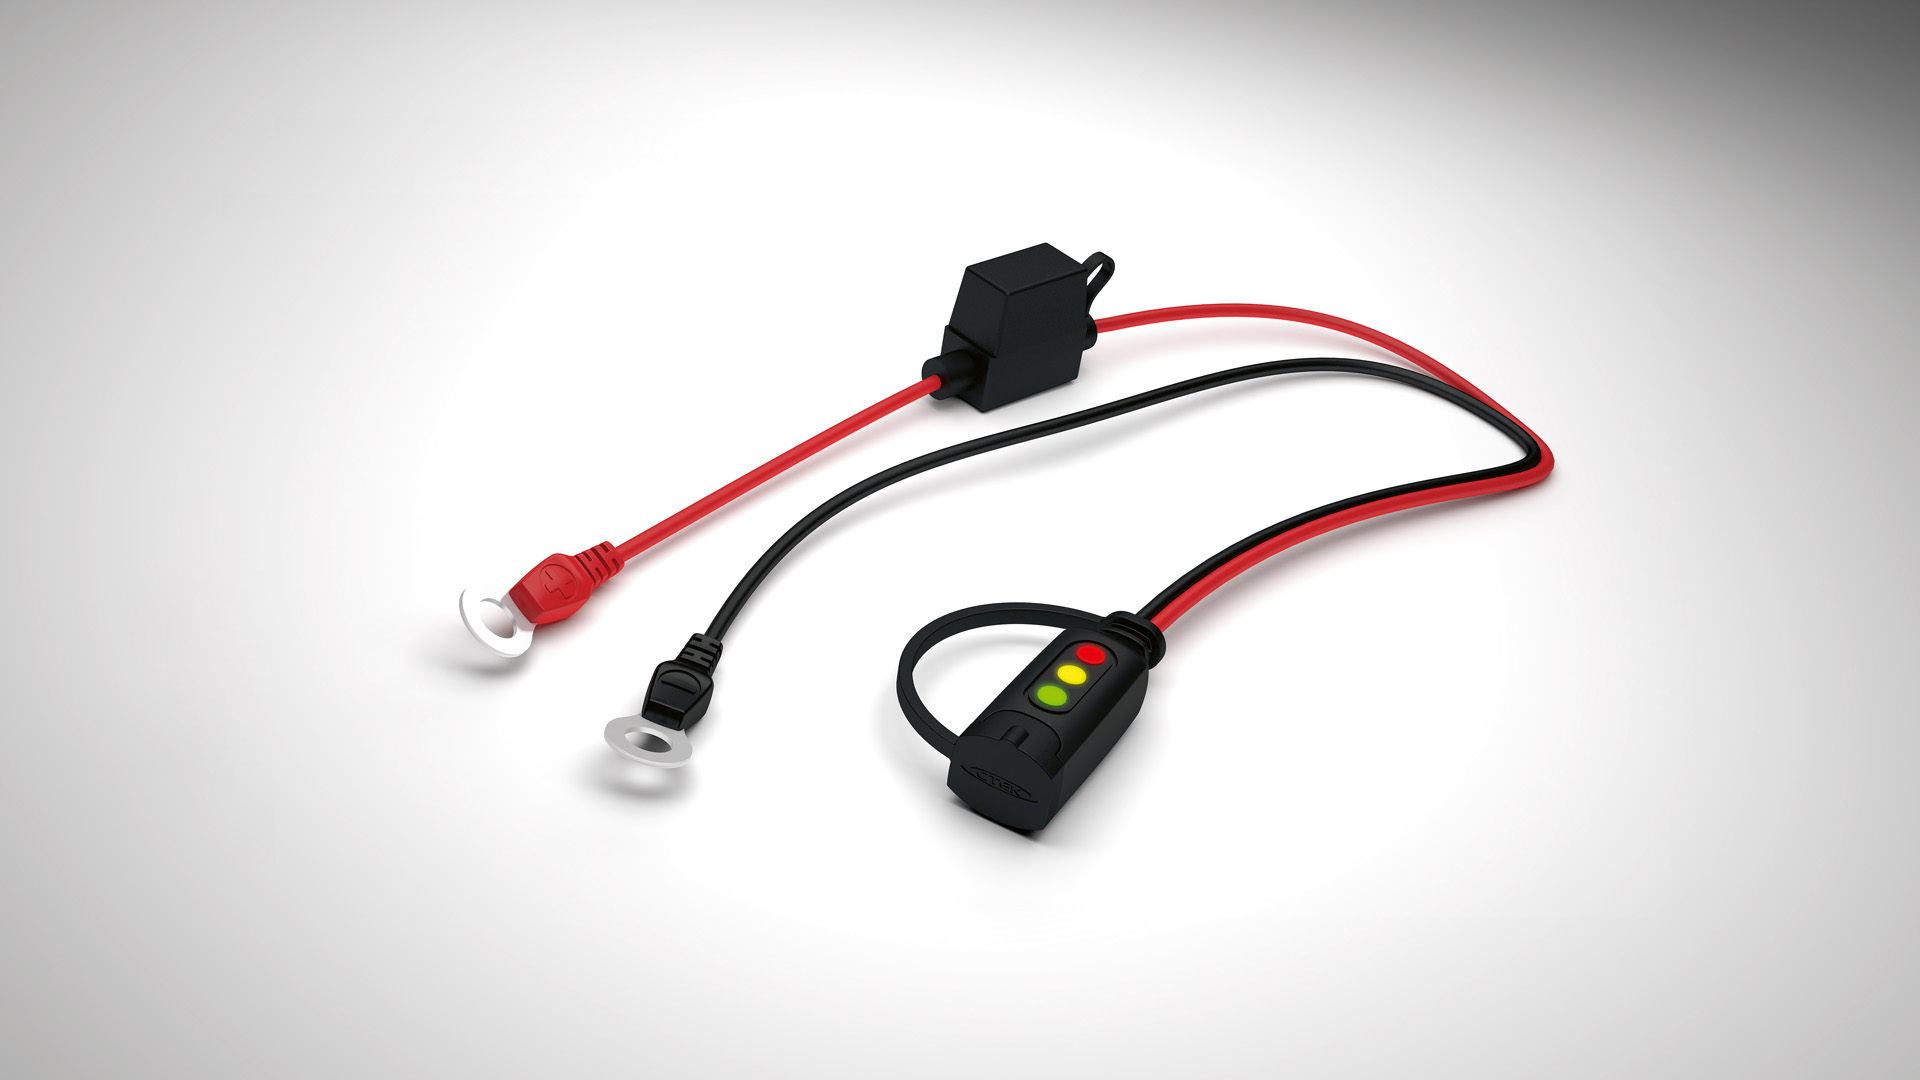 Ctek Comfort Connettore con Indicatore di Carica M8 Occhielli 56-382